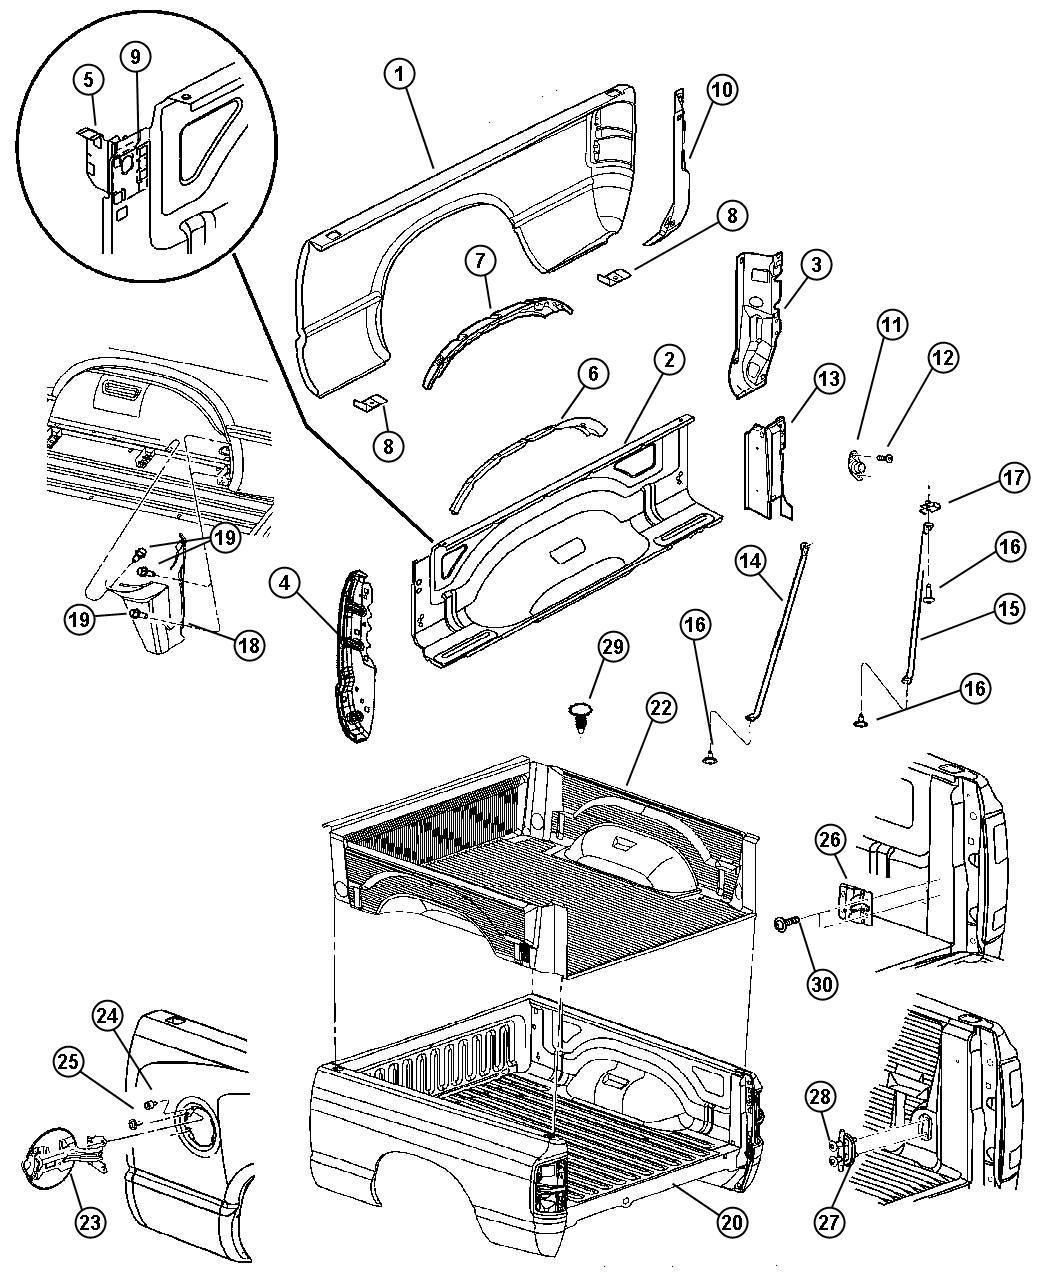 Dodge Ram 3500 Bedliner kit. Under rail. 6.5 foot